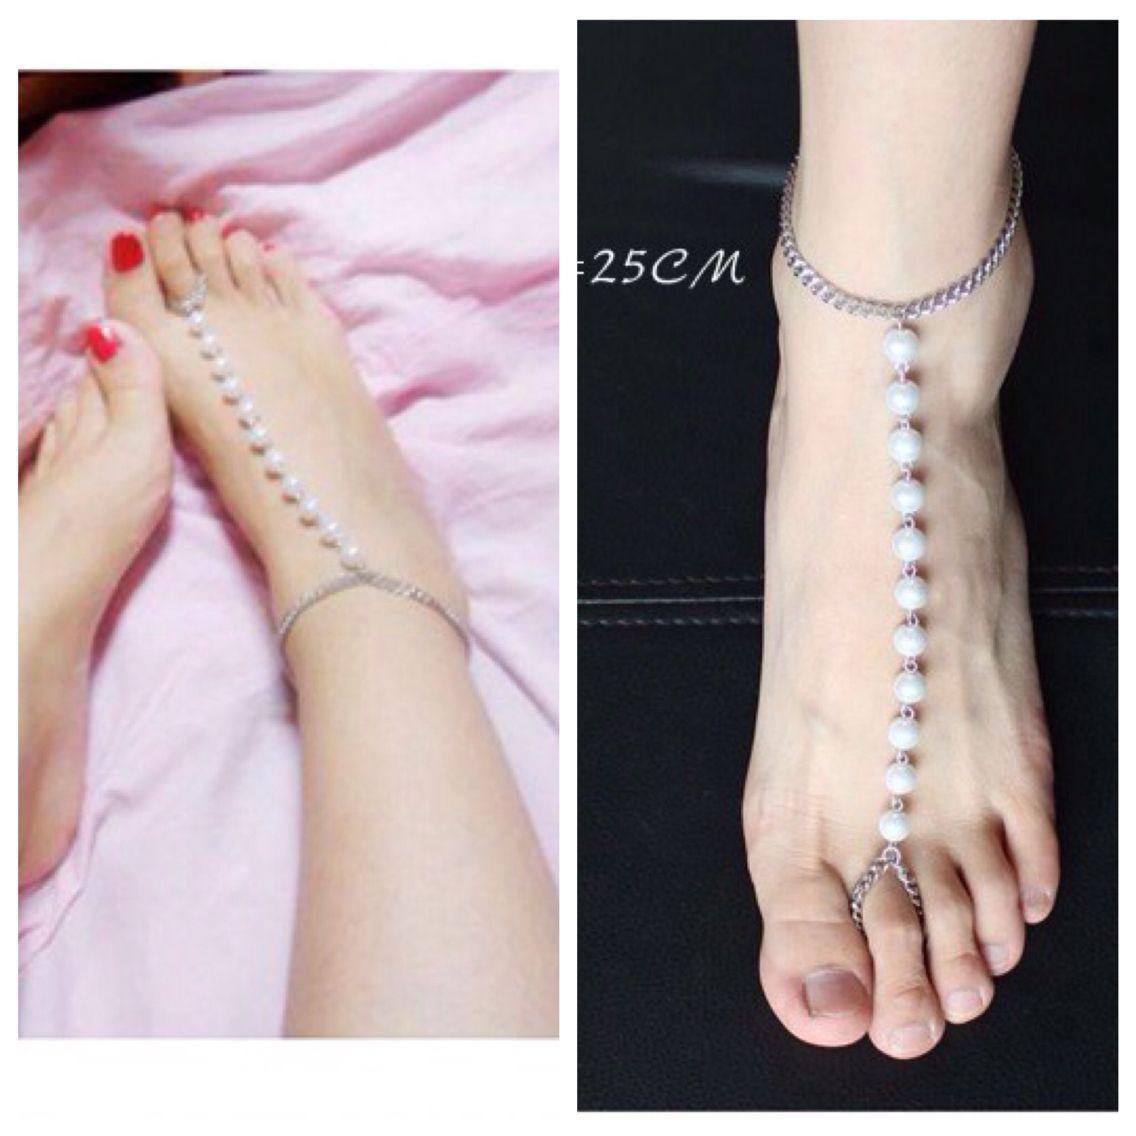 67f6327c37d LOLEY53902 - Rs 350 -  jewellery  anklets  stylish  pearls  indowestern   fusion  fashion  style  love  like  grab  lolstudiops  mangalore  madikeri   india ...